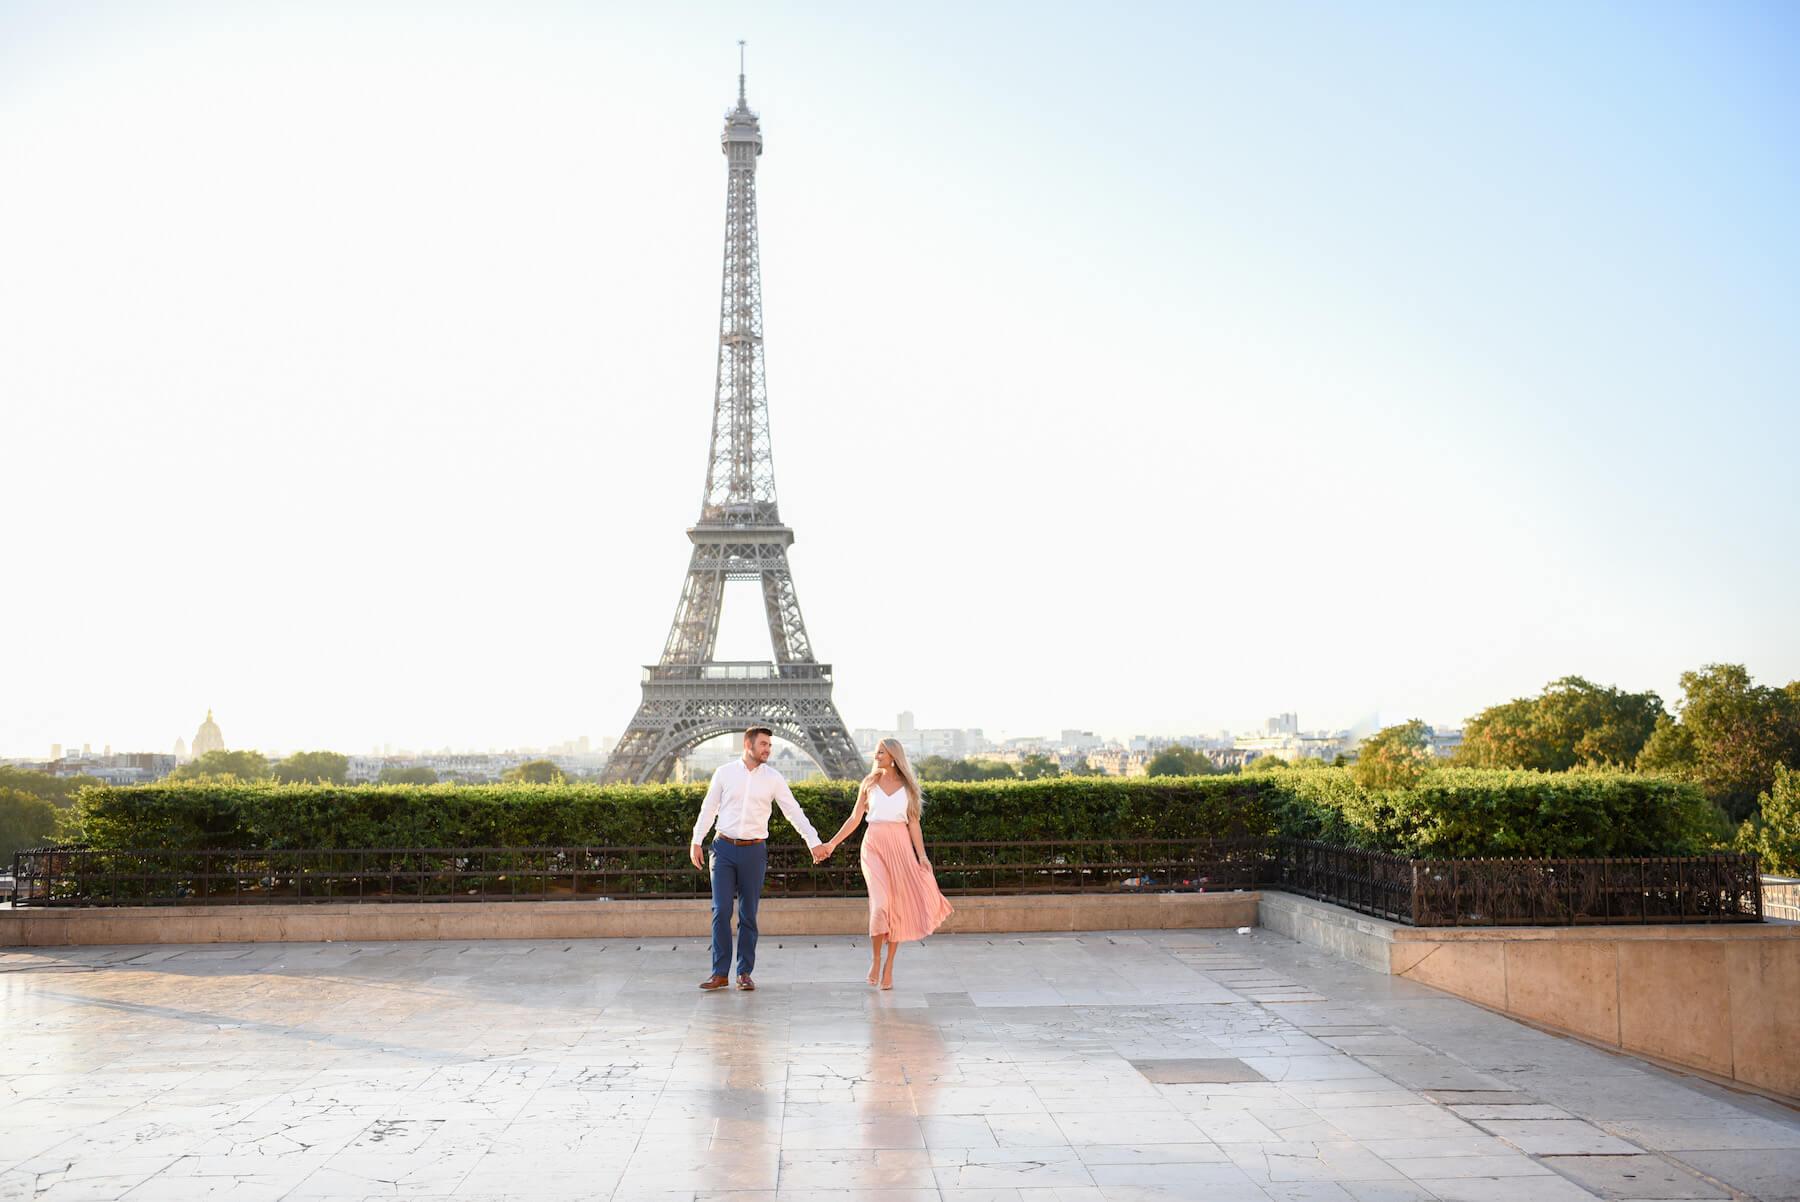 paris-09-02-2019-anniversary-38_original